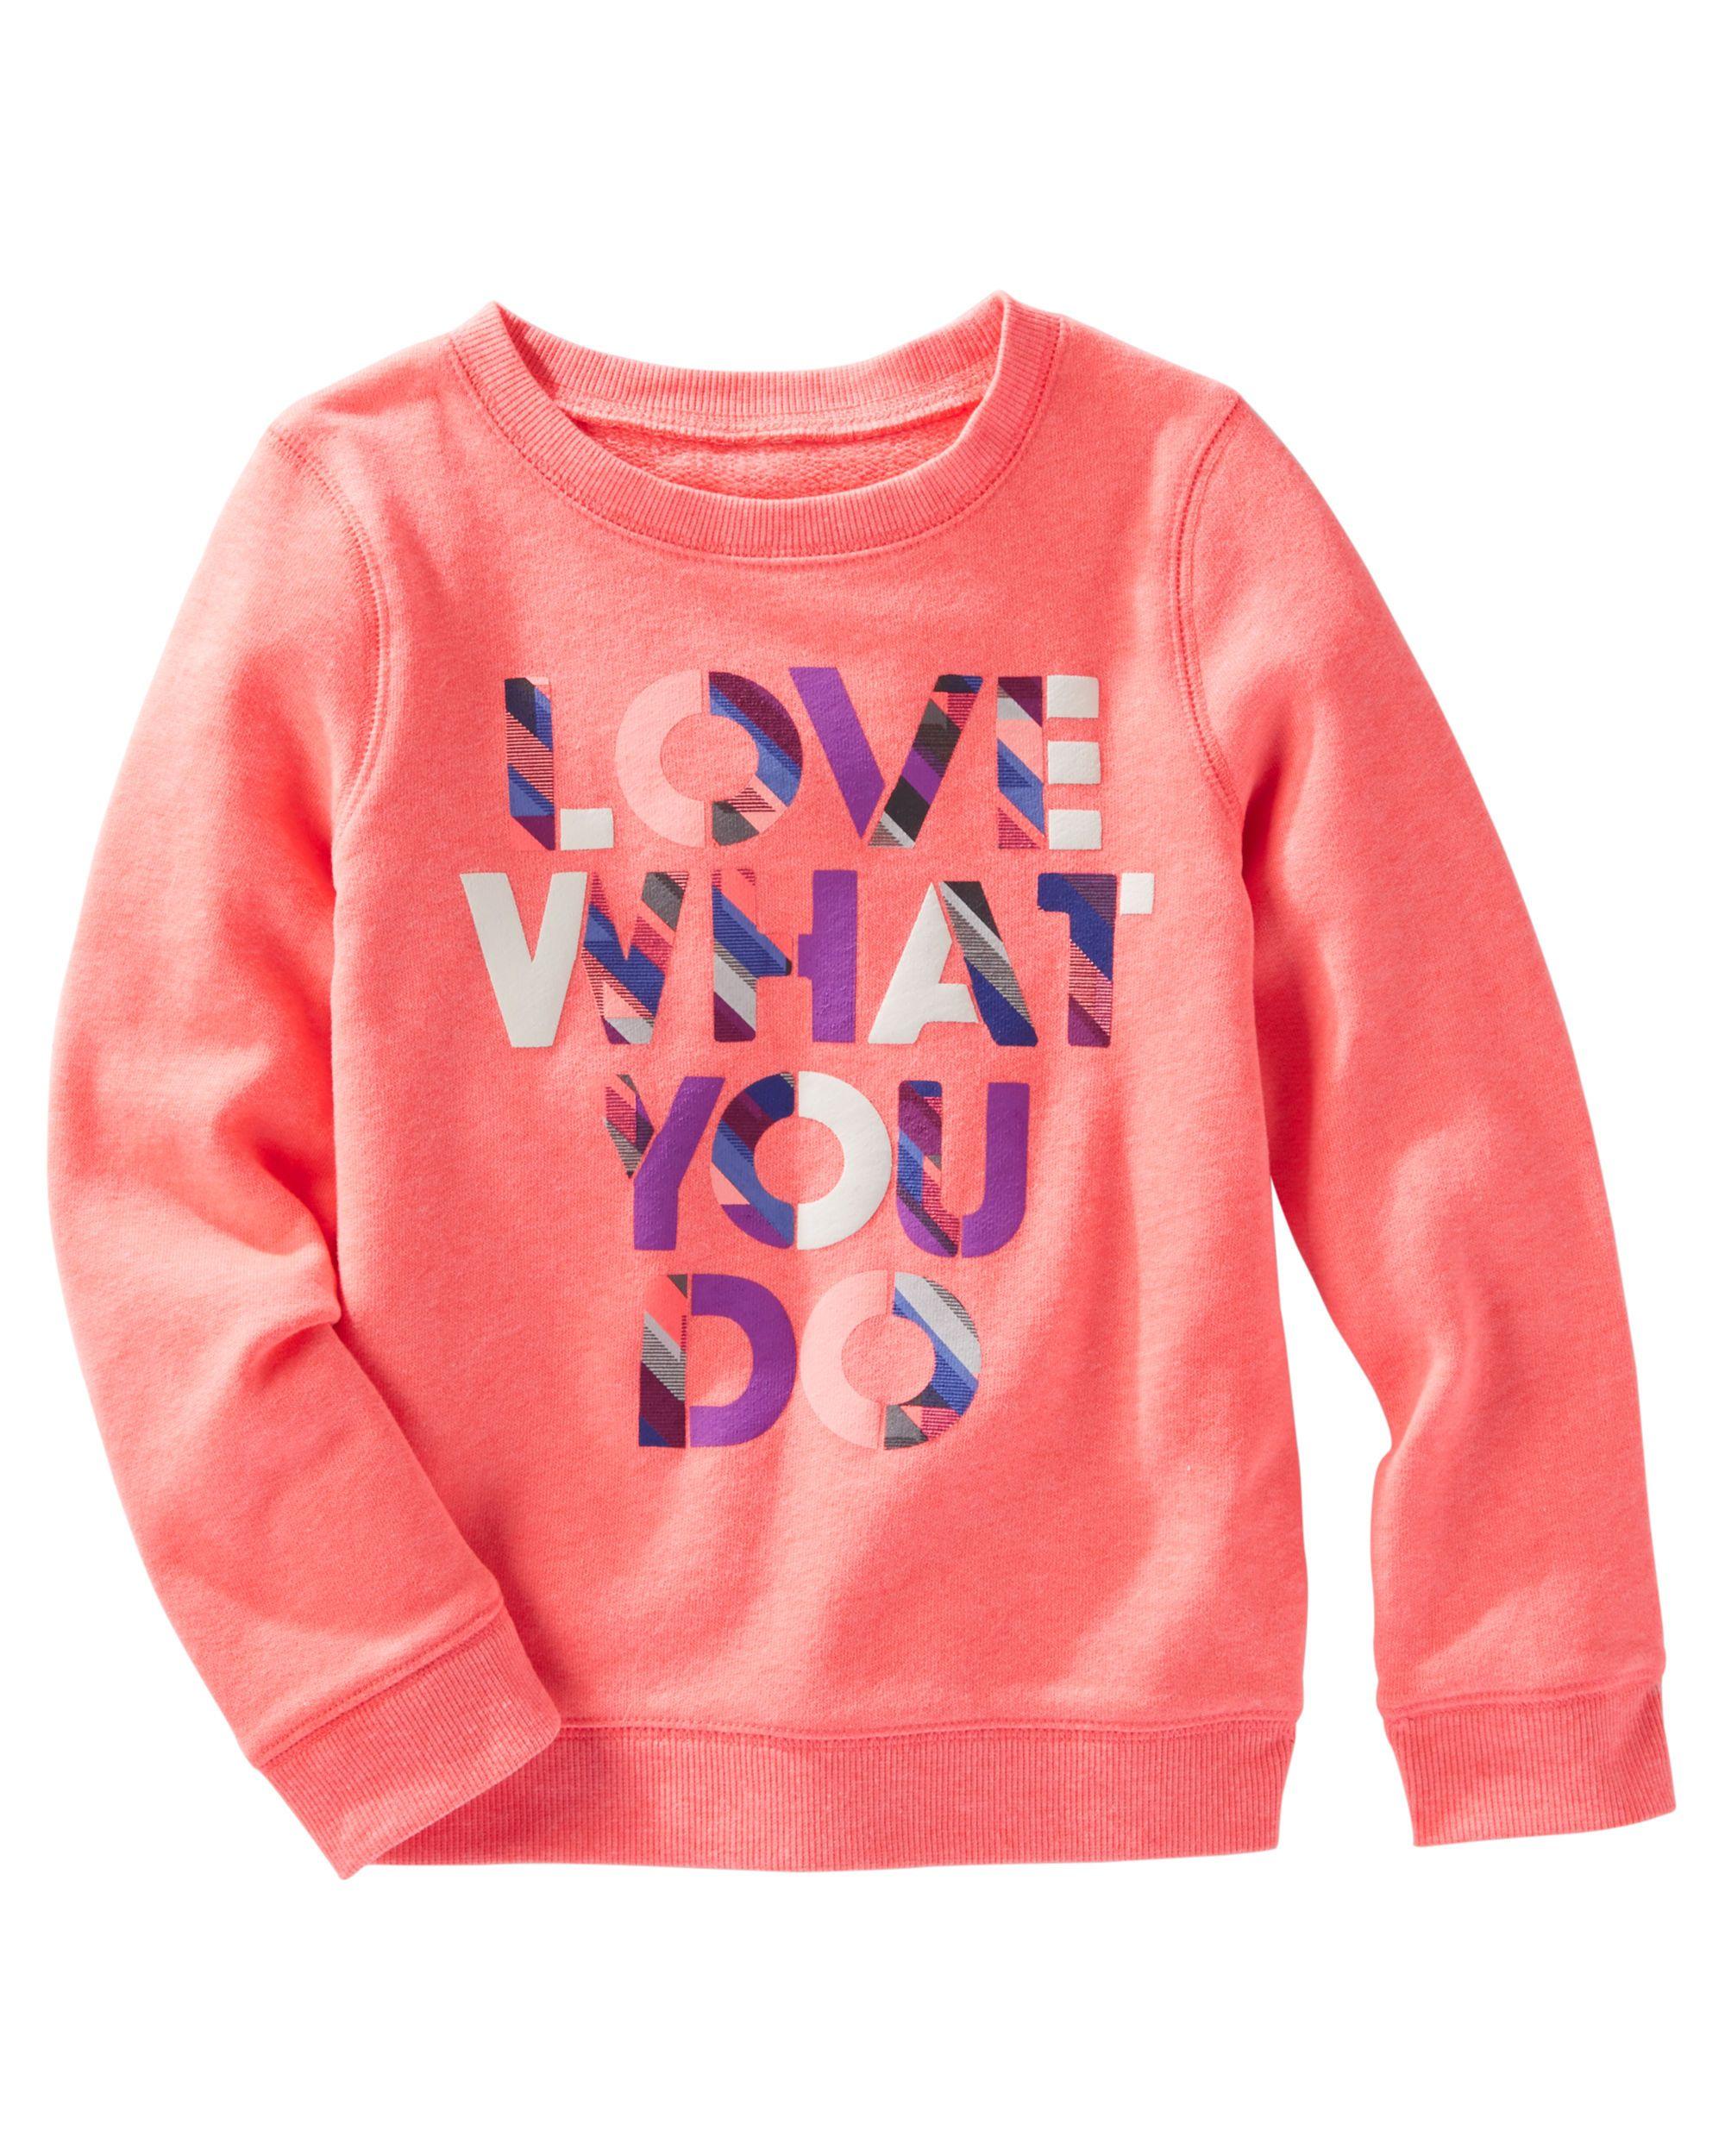 Adults Childs Boys Girls FUSCHIA HOT PINK CERISE Hoodie Hooded Sweatshirt Hoodi